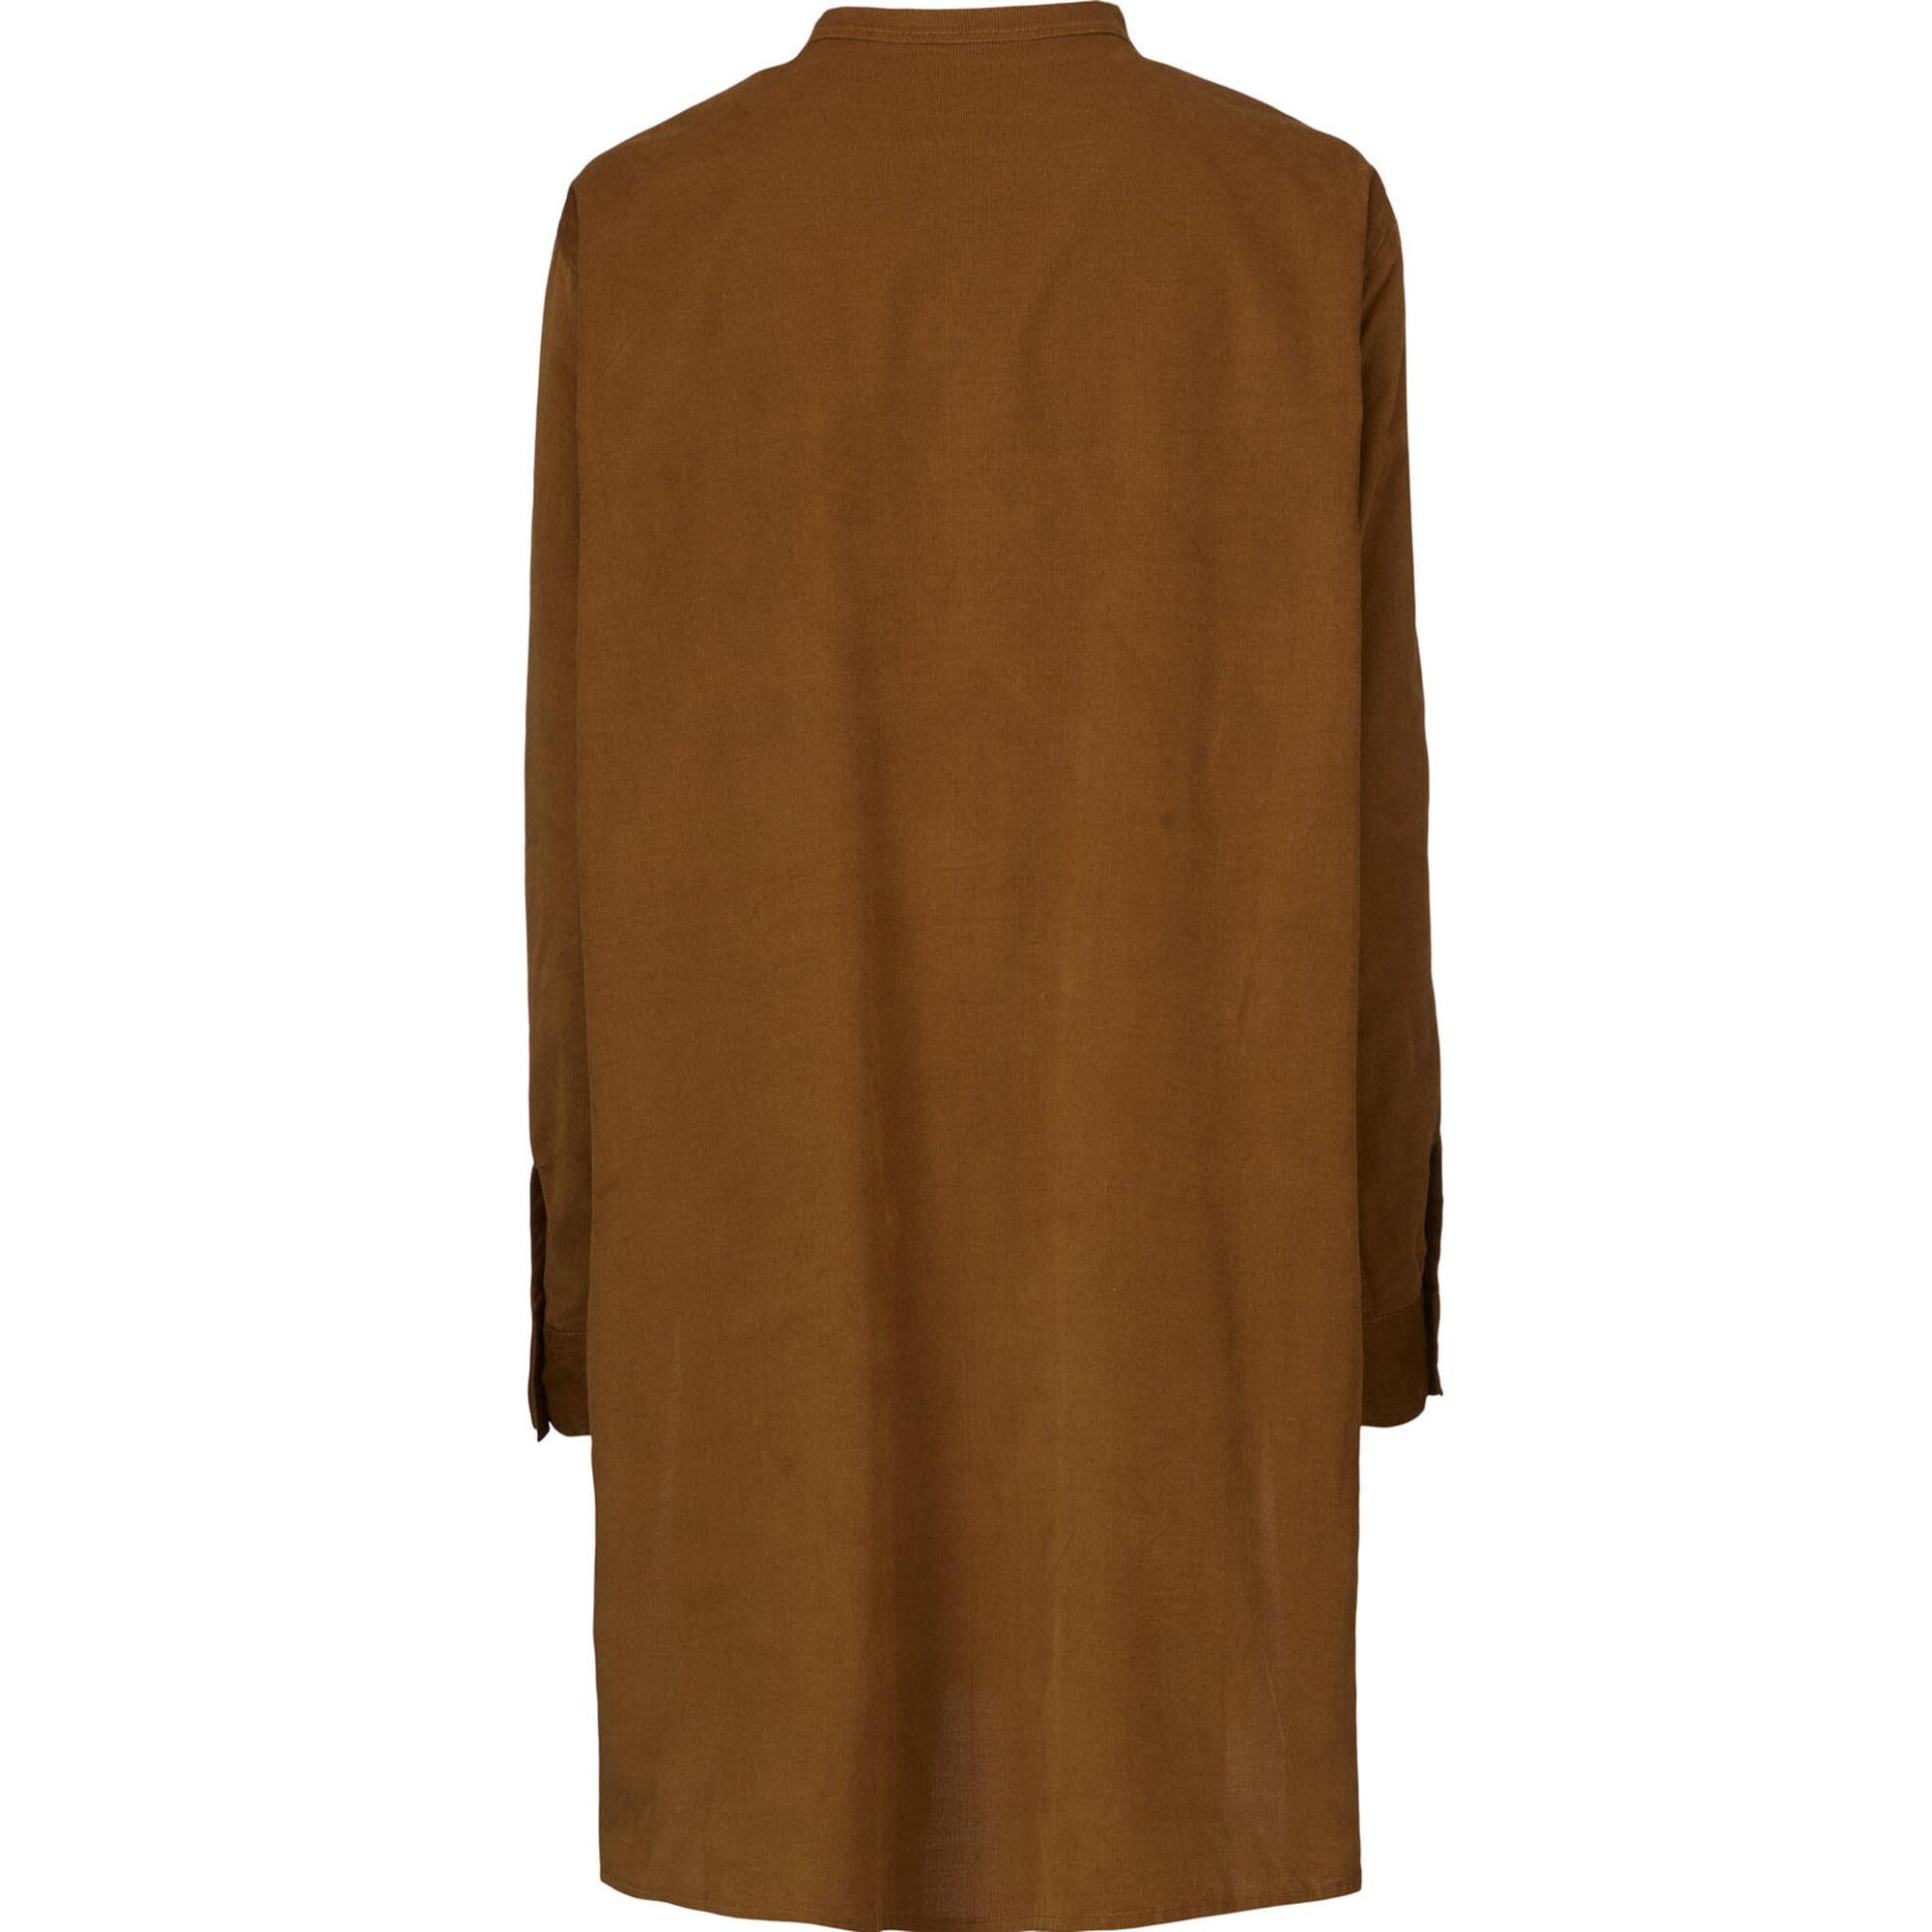 GLORIA TUNIKA, Monk's Robe, hi-res